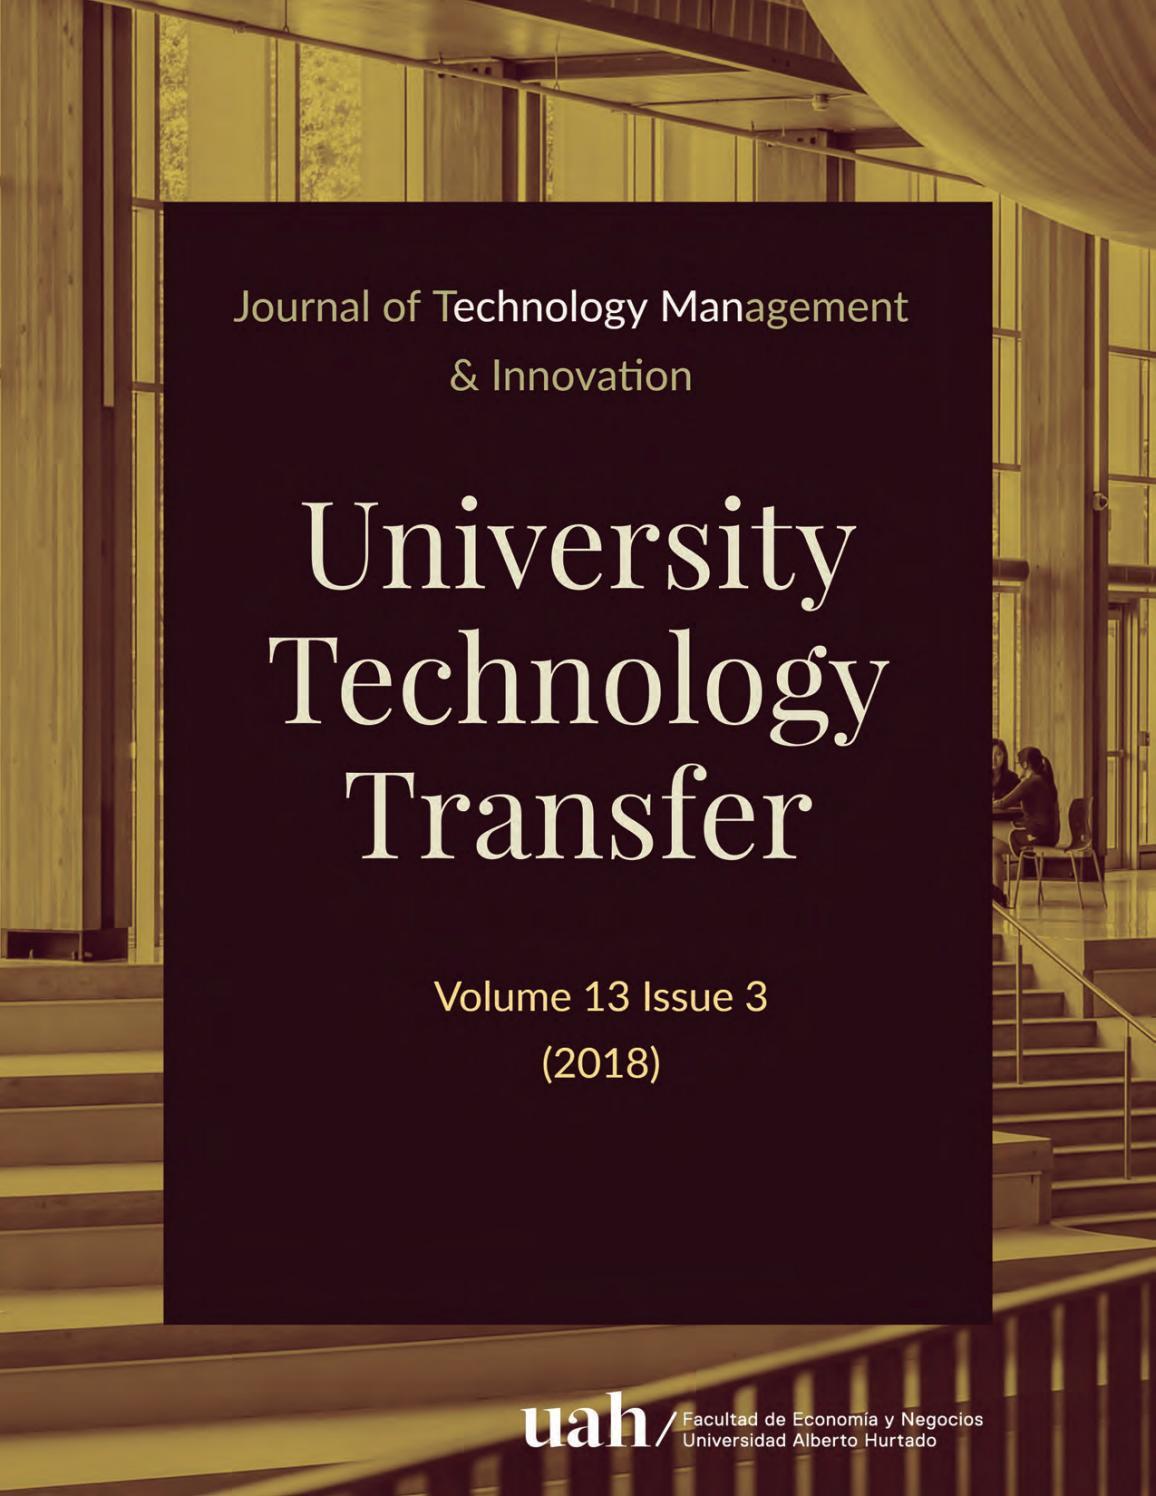 Volume 13 - Issue 3 (2018) by Chimera Innova Group - issuu